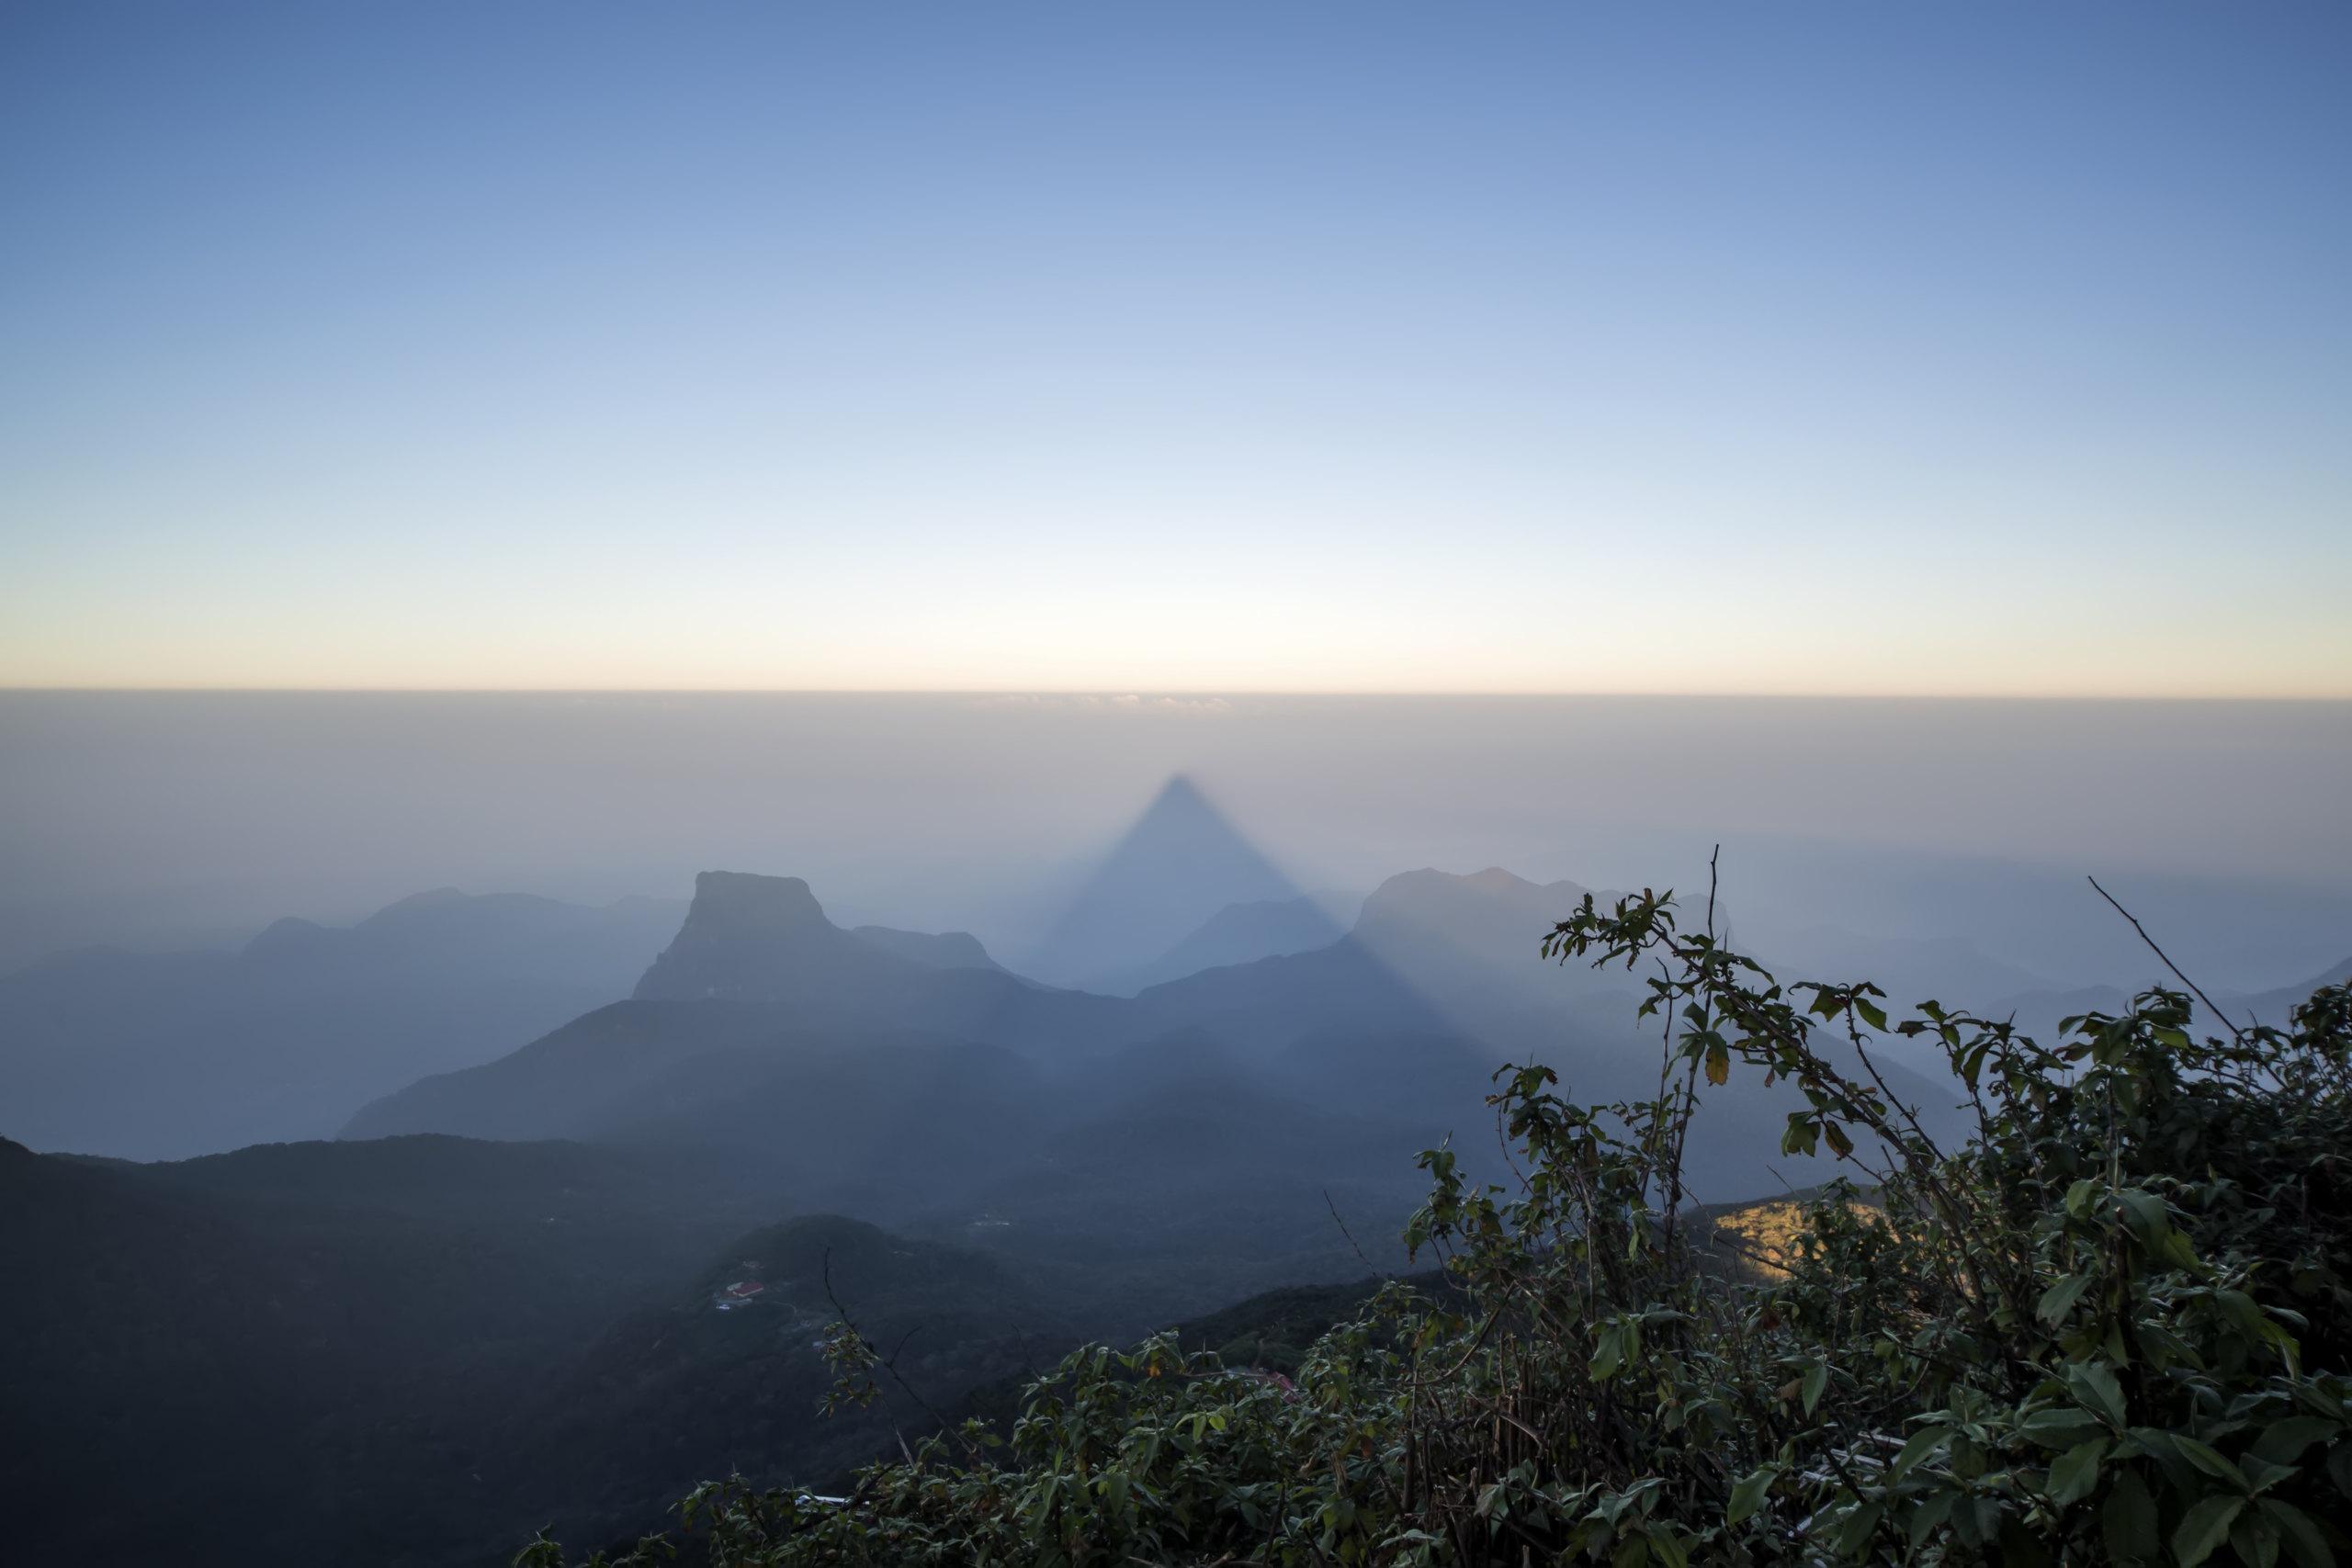 Destinations_Sri-Lanka_Hill-Country_Adams-Peak_iStock_000047987968_Large